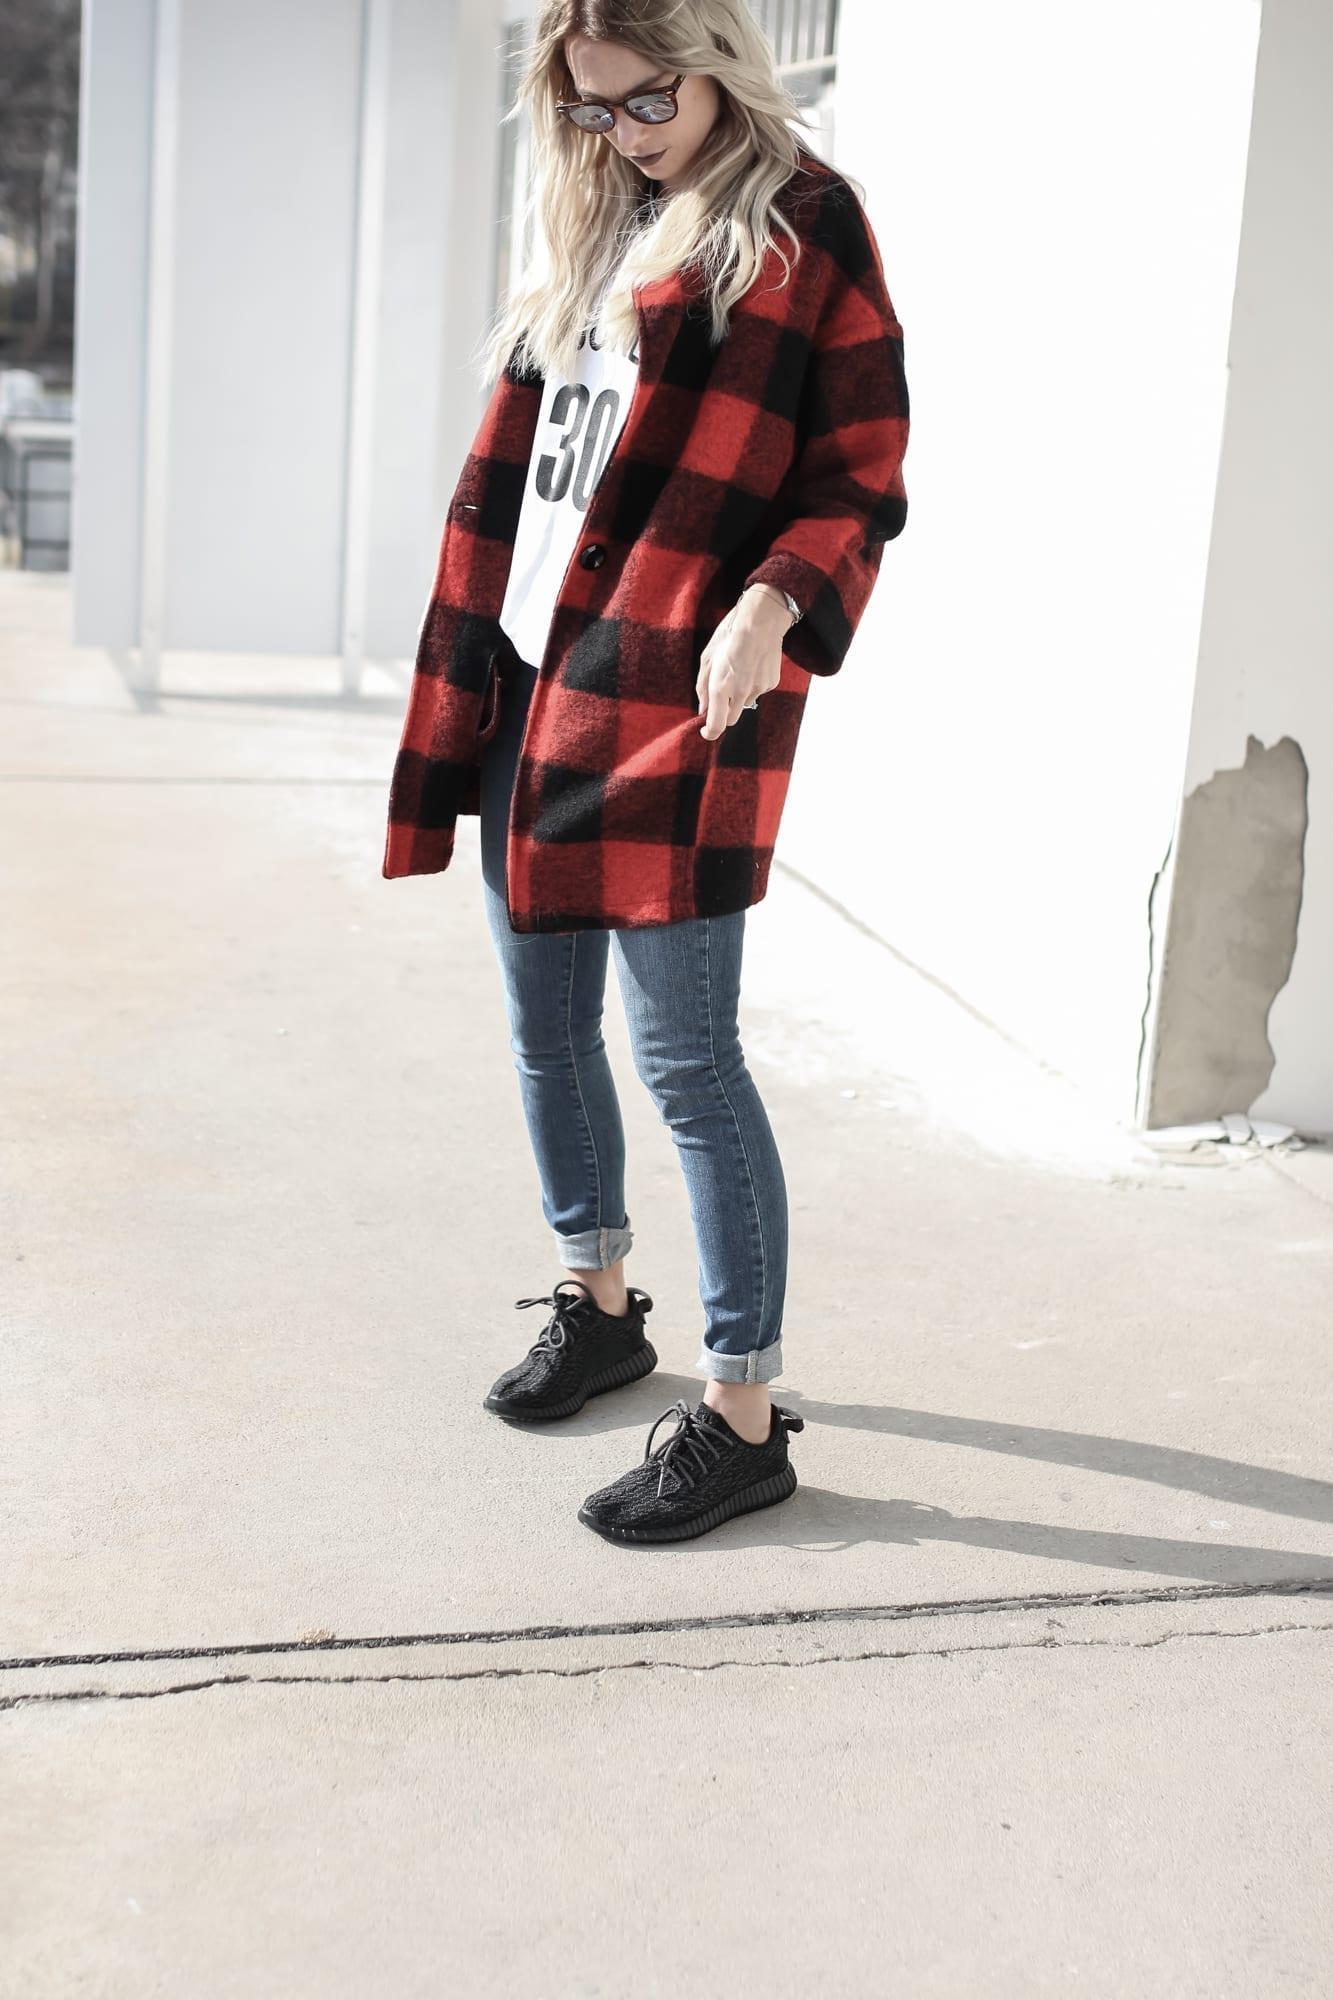 CK_1603_constantlyk_yeezy_fashion-8275